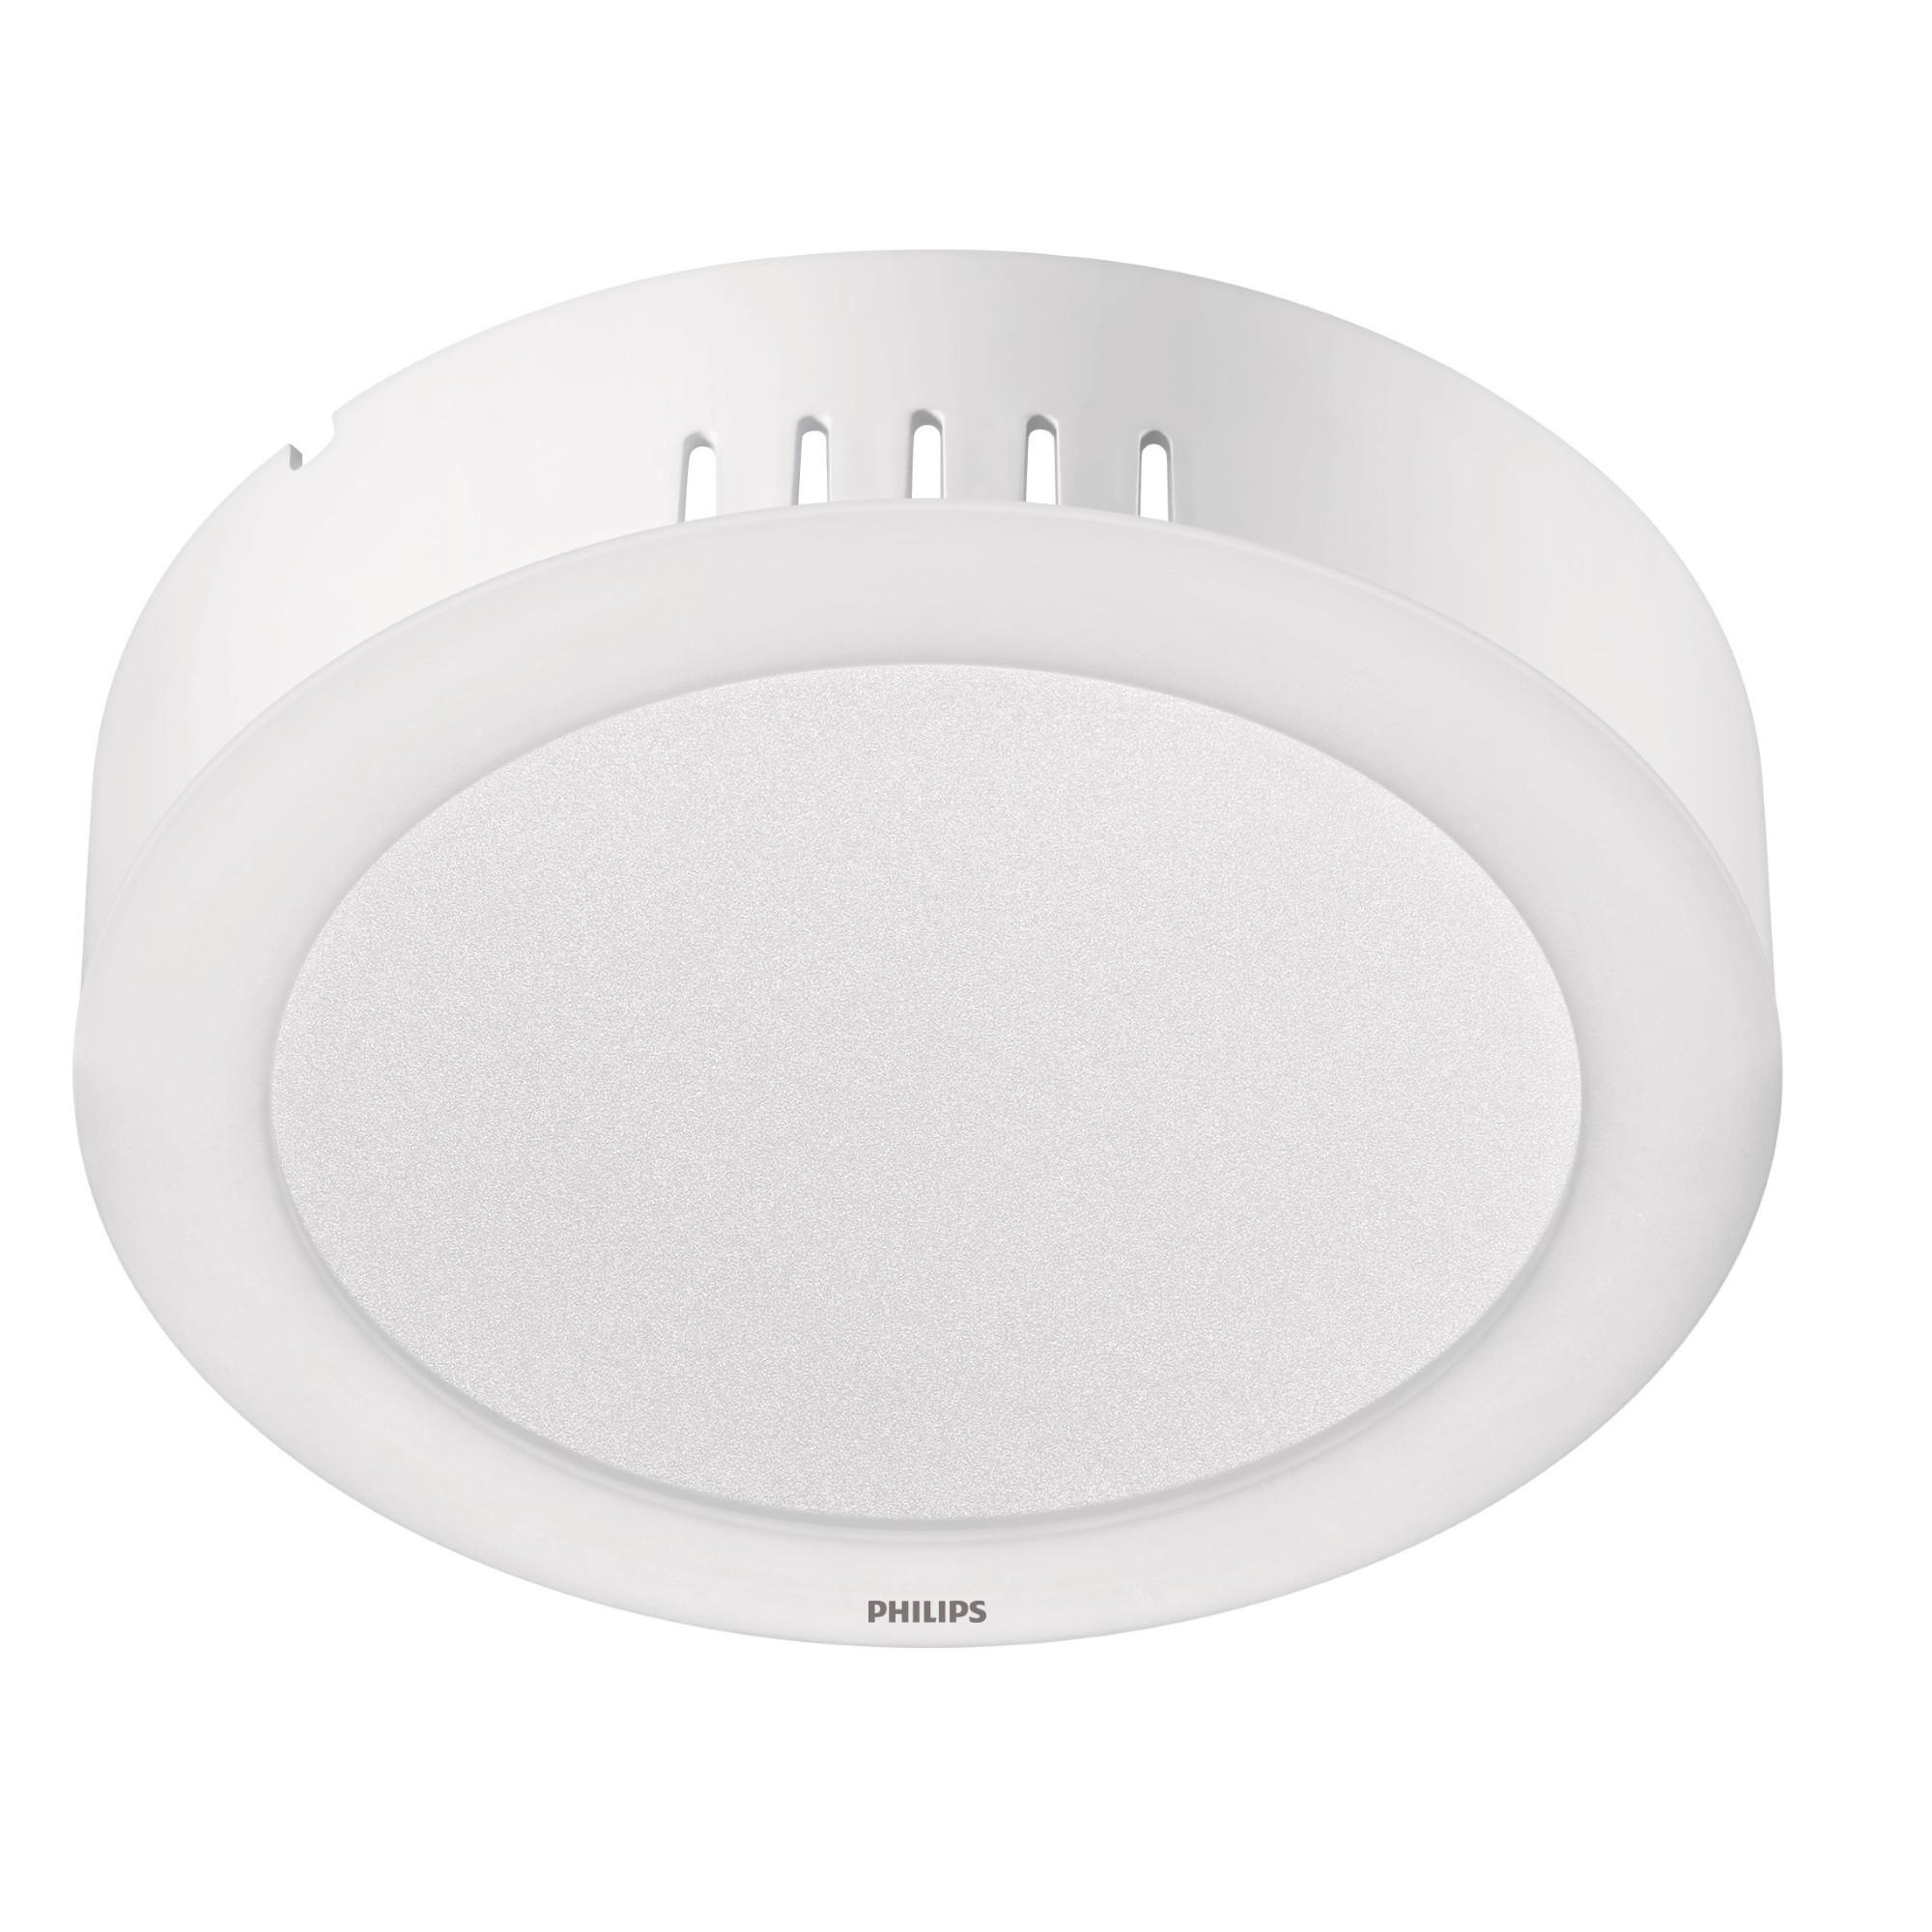 Painel LED Redondo 15W Luz Neutra 1550lm - Philips